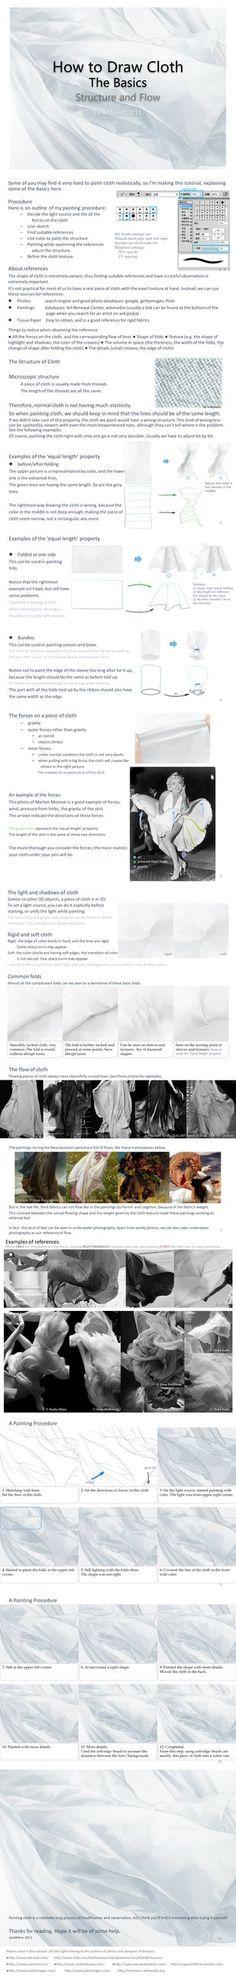 How to Draw Cloth ,How to Draw Fabric Folds Tutorial by Jane Mere,How to Draw Fabric Folds ,Resources for Art Students / Art School Portfolio @ CAPI ::: Create Art Portfolio Ideas at milliande.com , How to Draw Clothing Human Figure, Clothes, Folds, Fabric, Crease